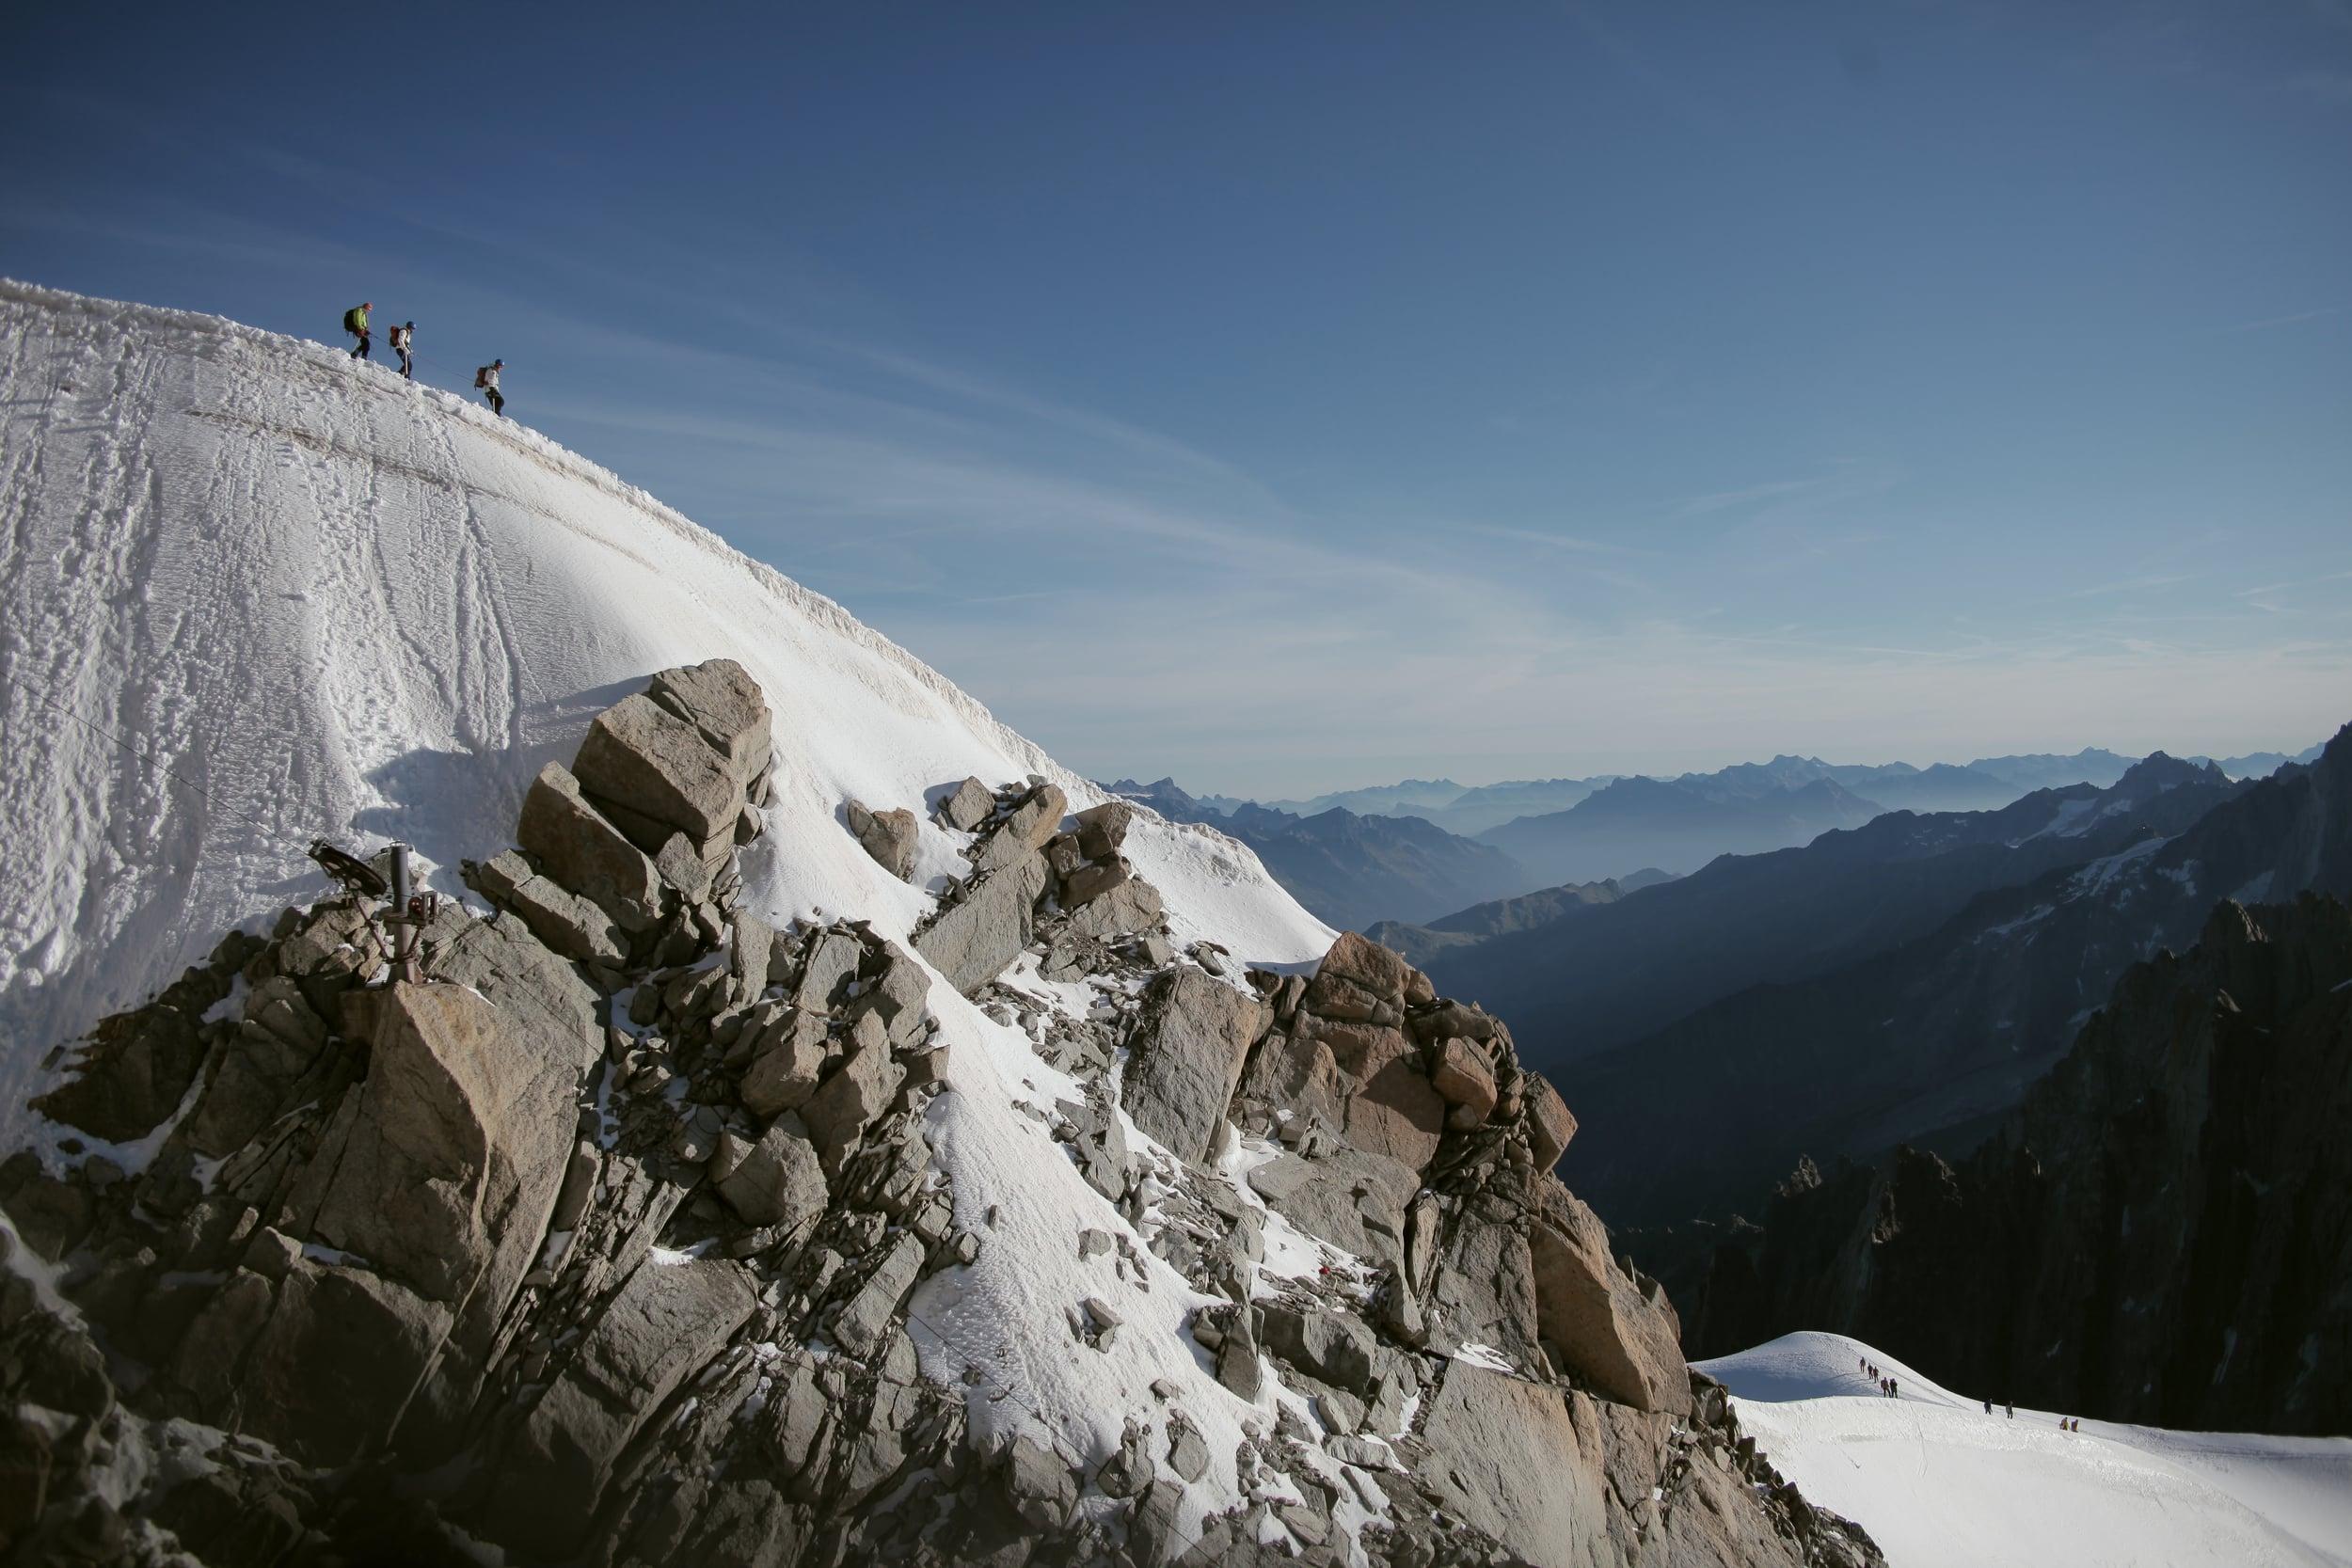 3 climbers IMG_9199.jpg